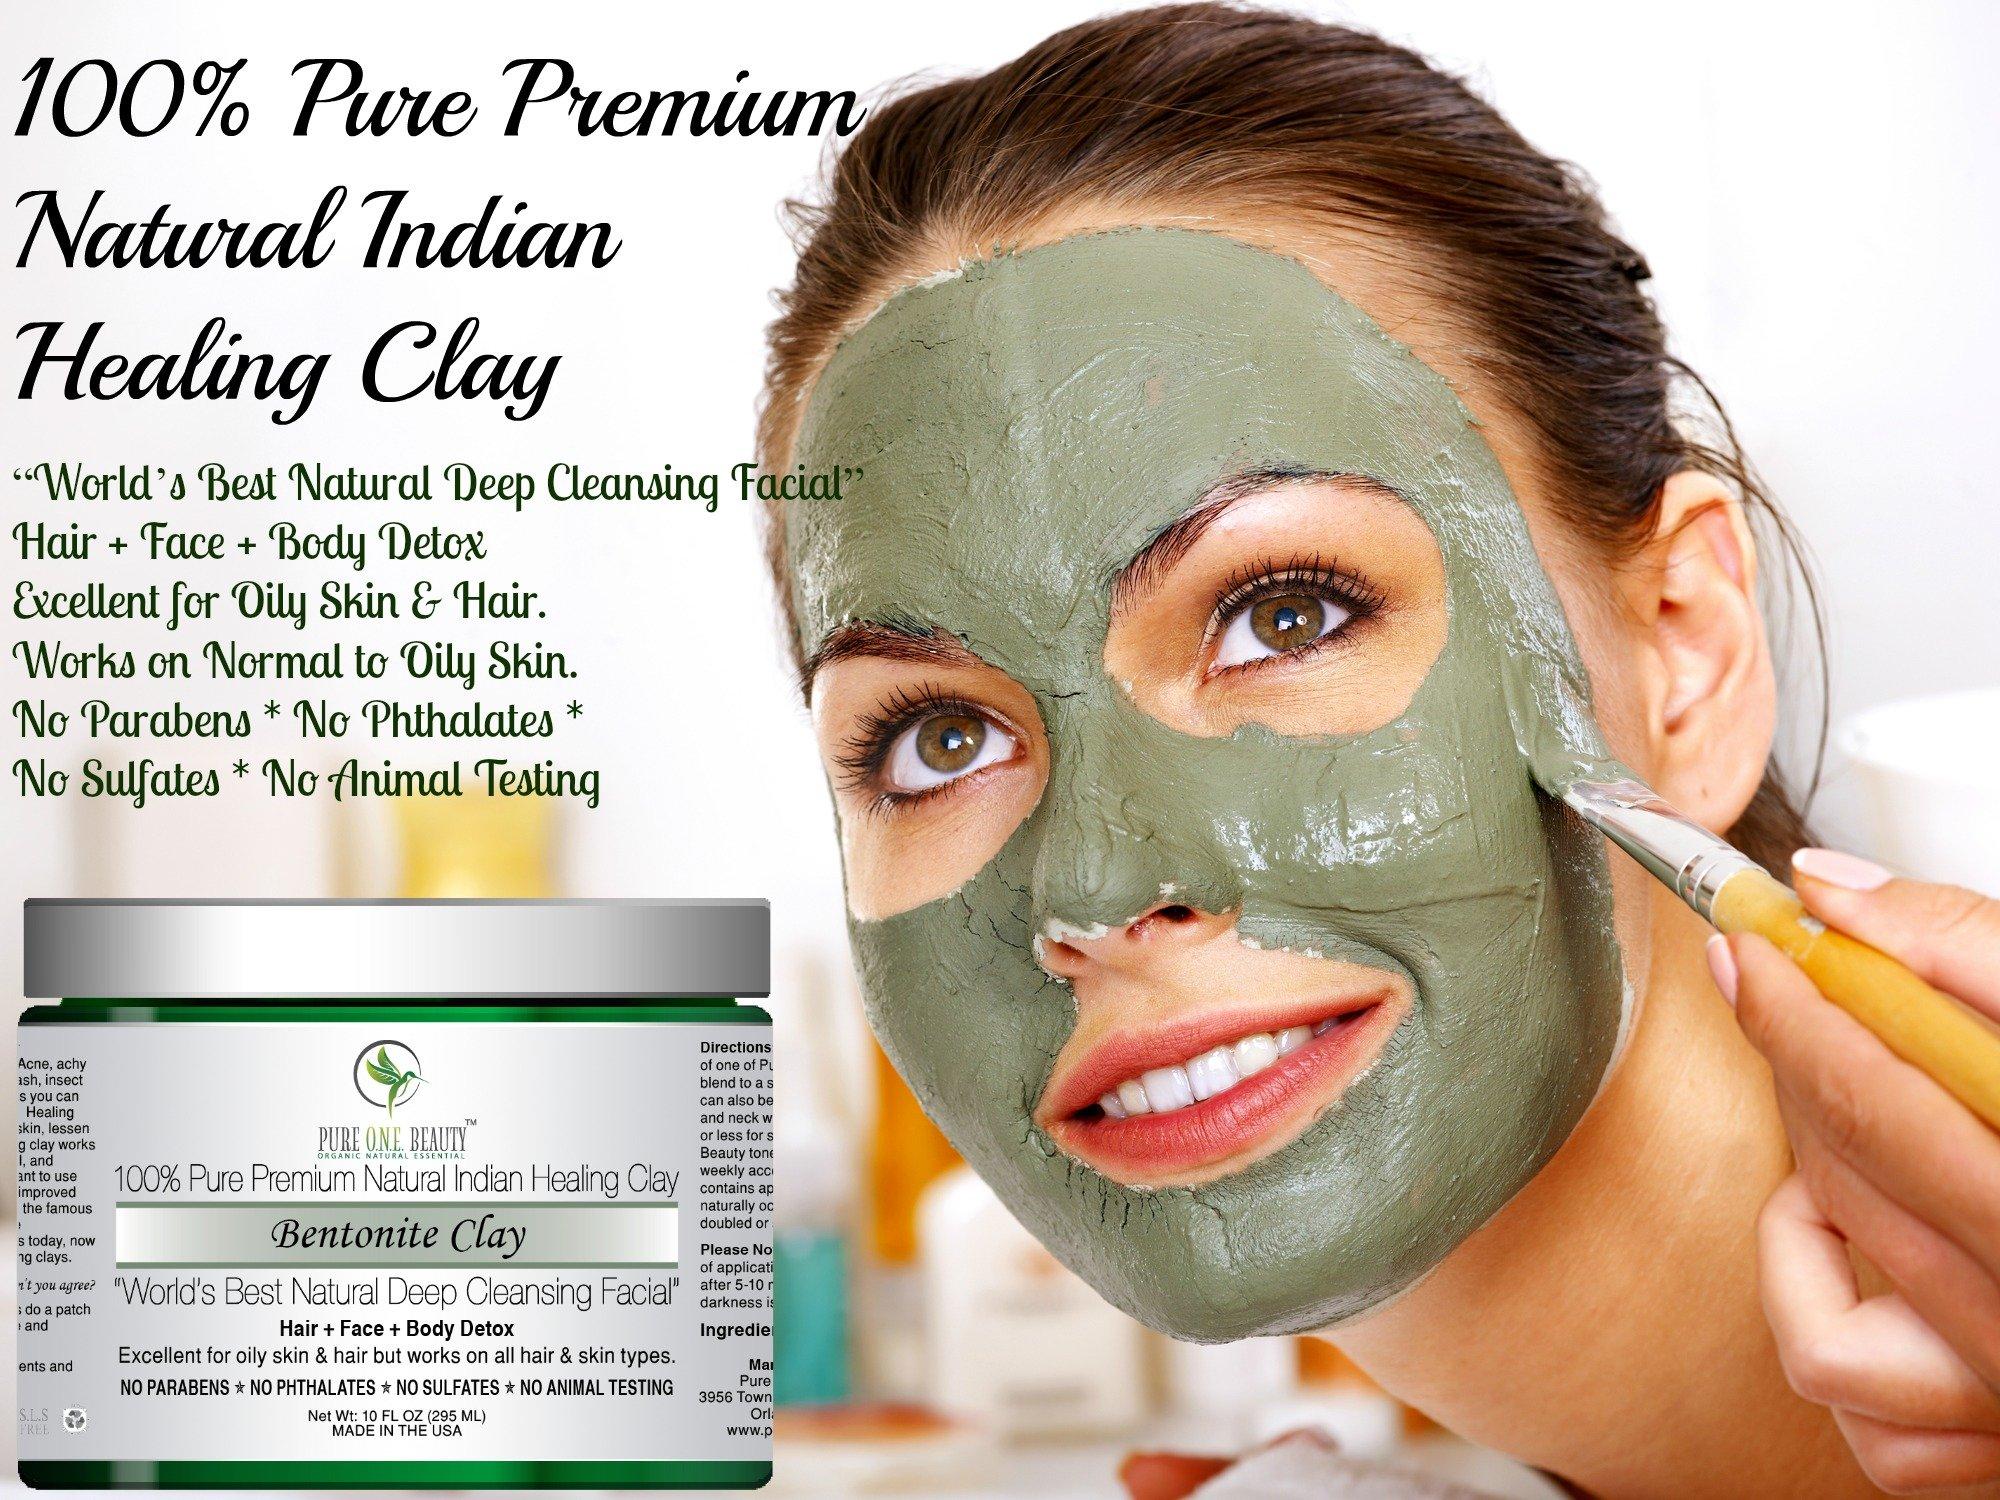 100% Pure Premium Natural Indian Healing Clay; Bentonite Clay: World's Best Natural Deep Cleansing Facial